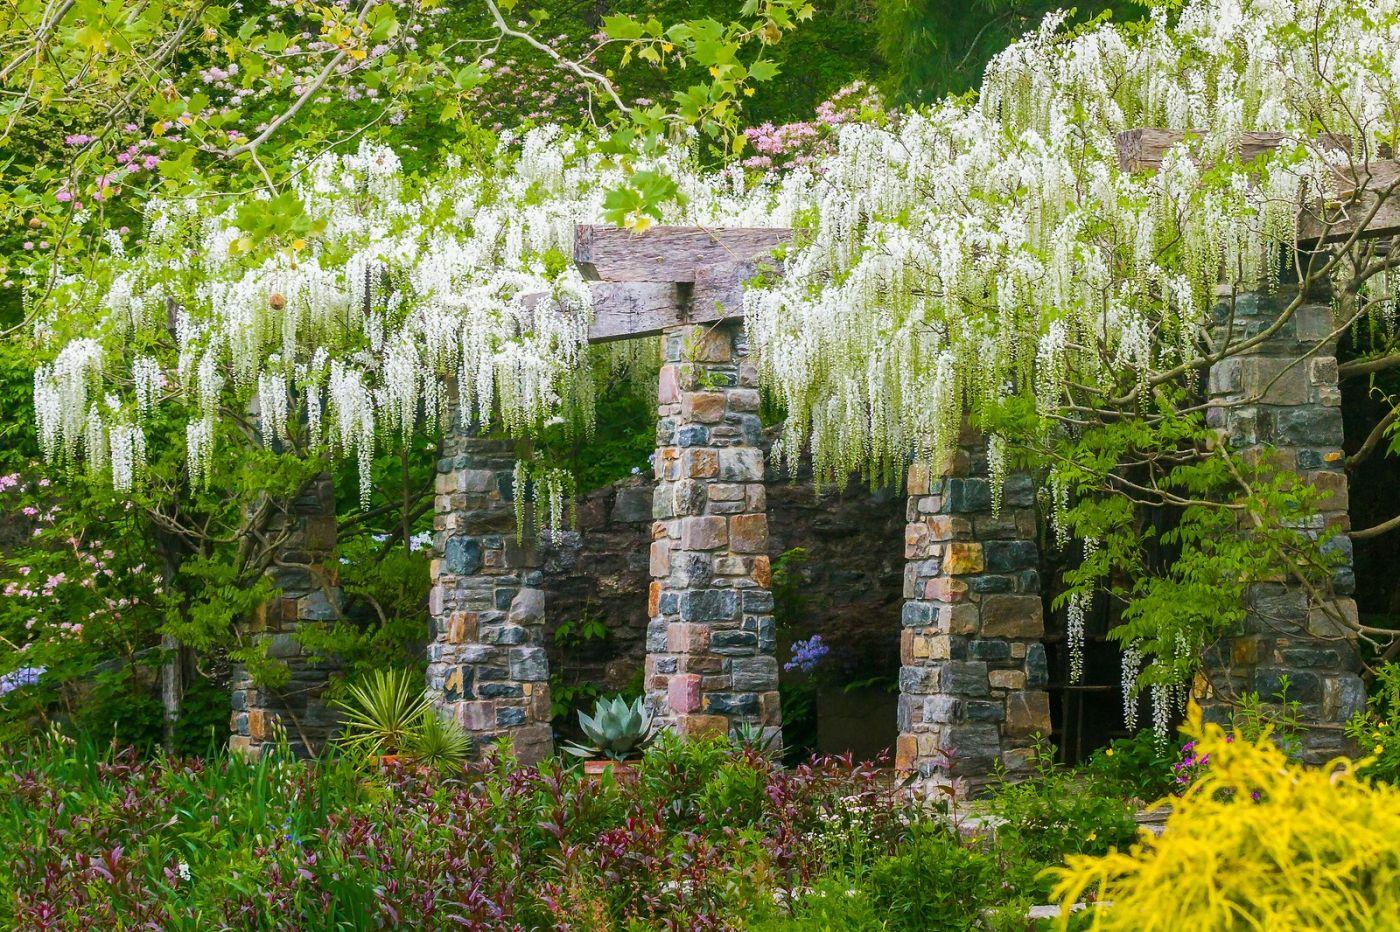 Chanticleer花园,那年盛开的紫藤花_图1-27